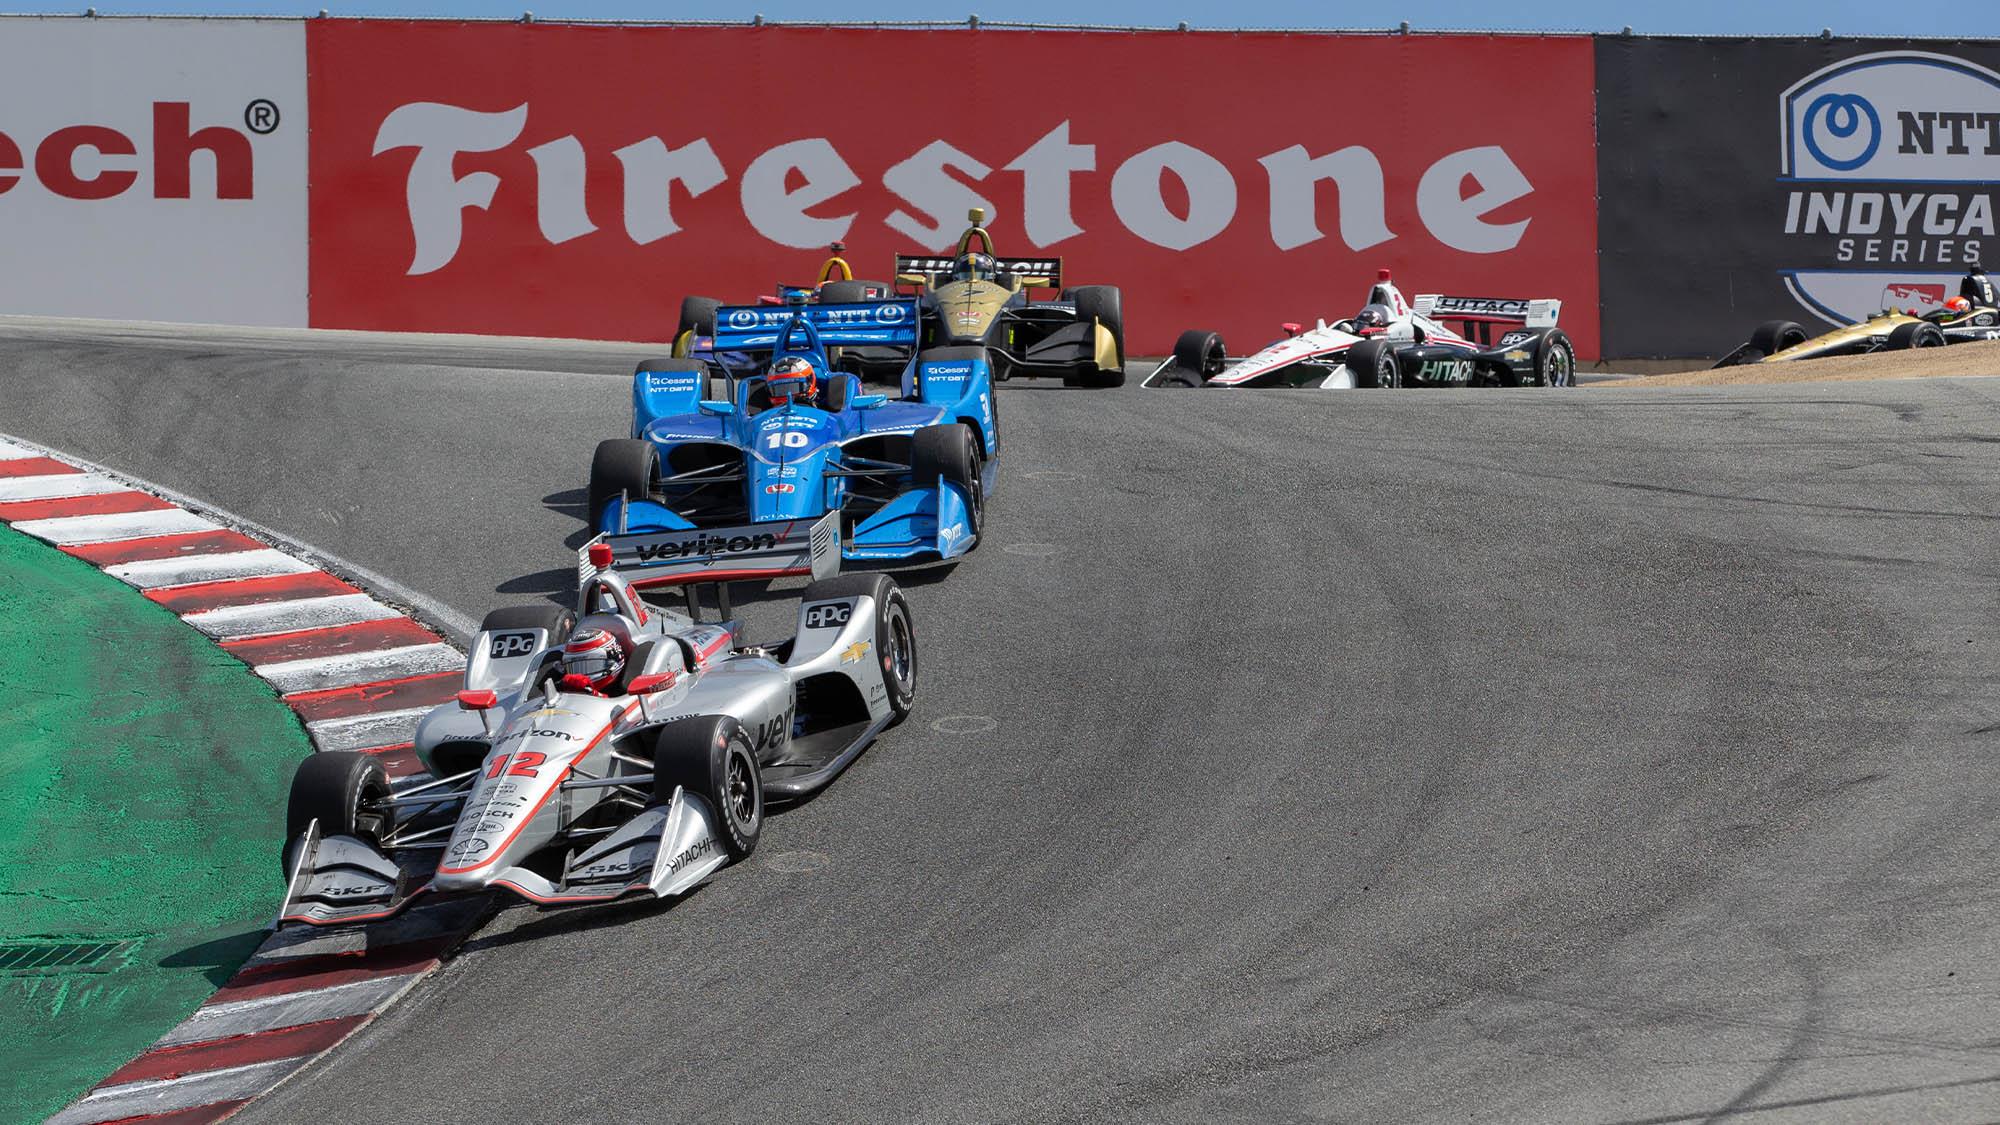 Laguna Seca corkscrew during the 2019 IndyCar Grand Prix of Monterey